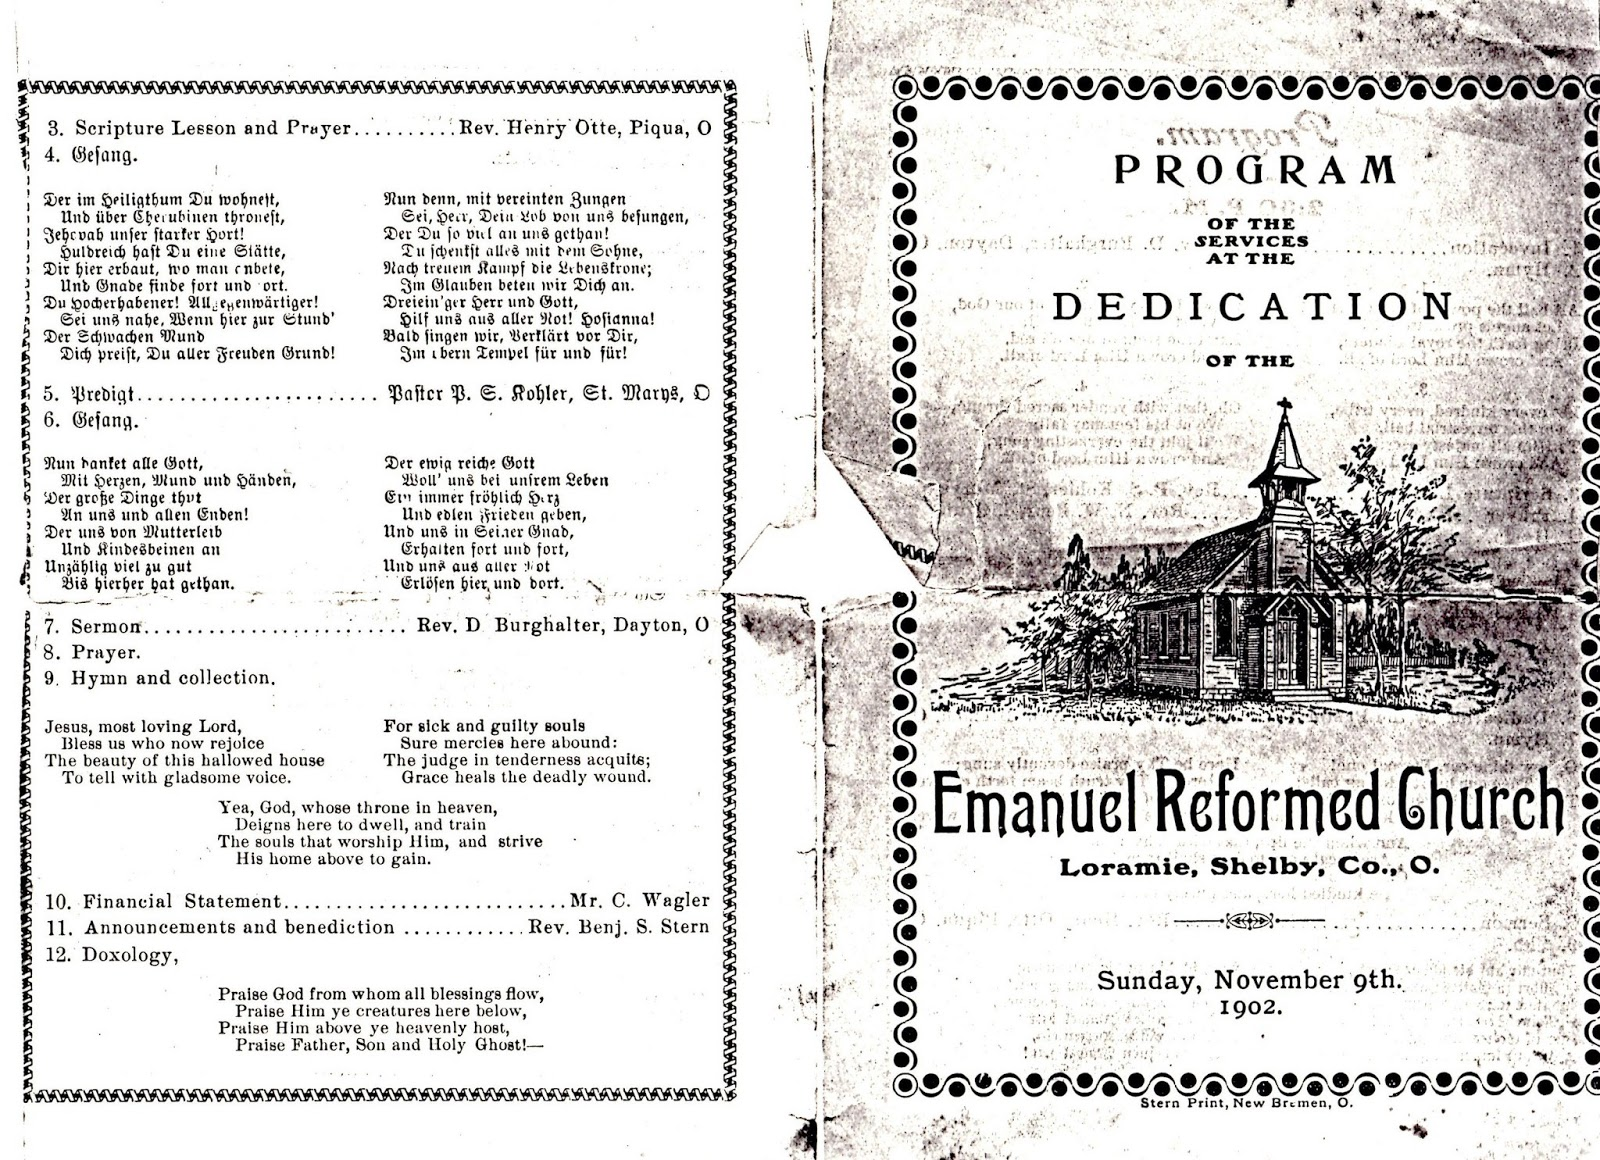 Boerger Pictorial History: Emanuel Reformed Church